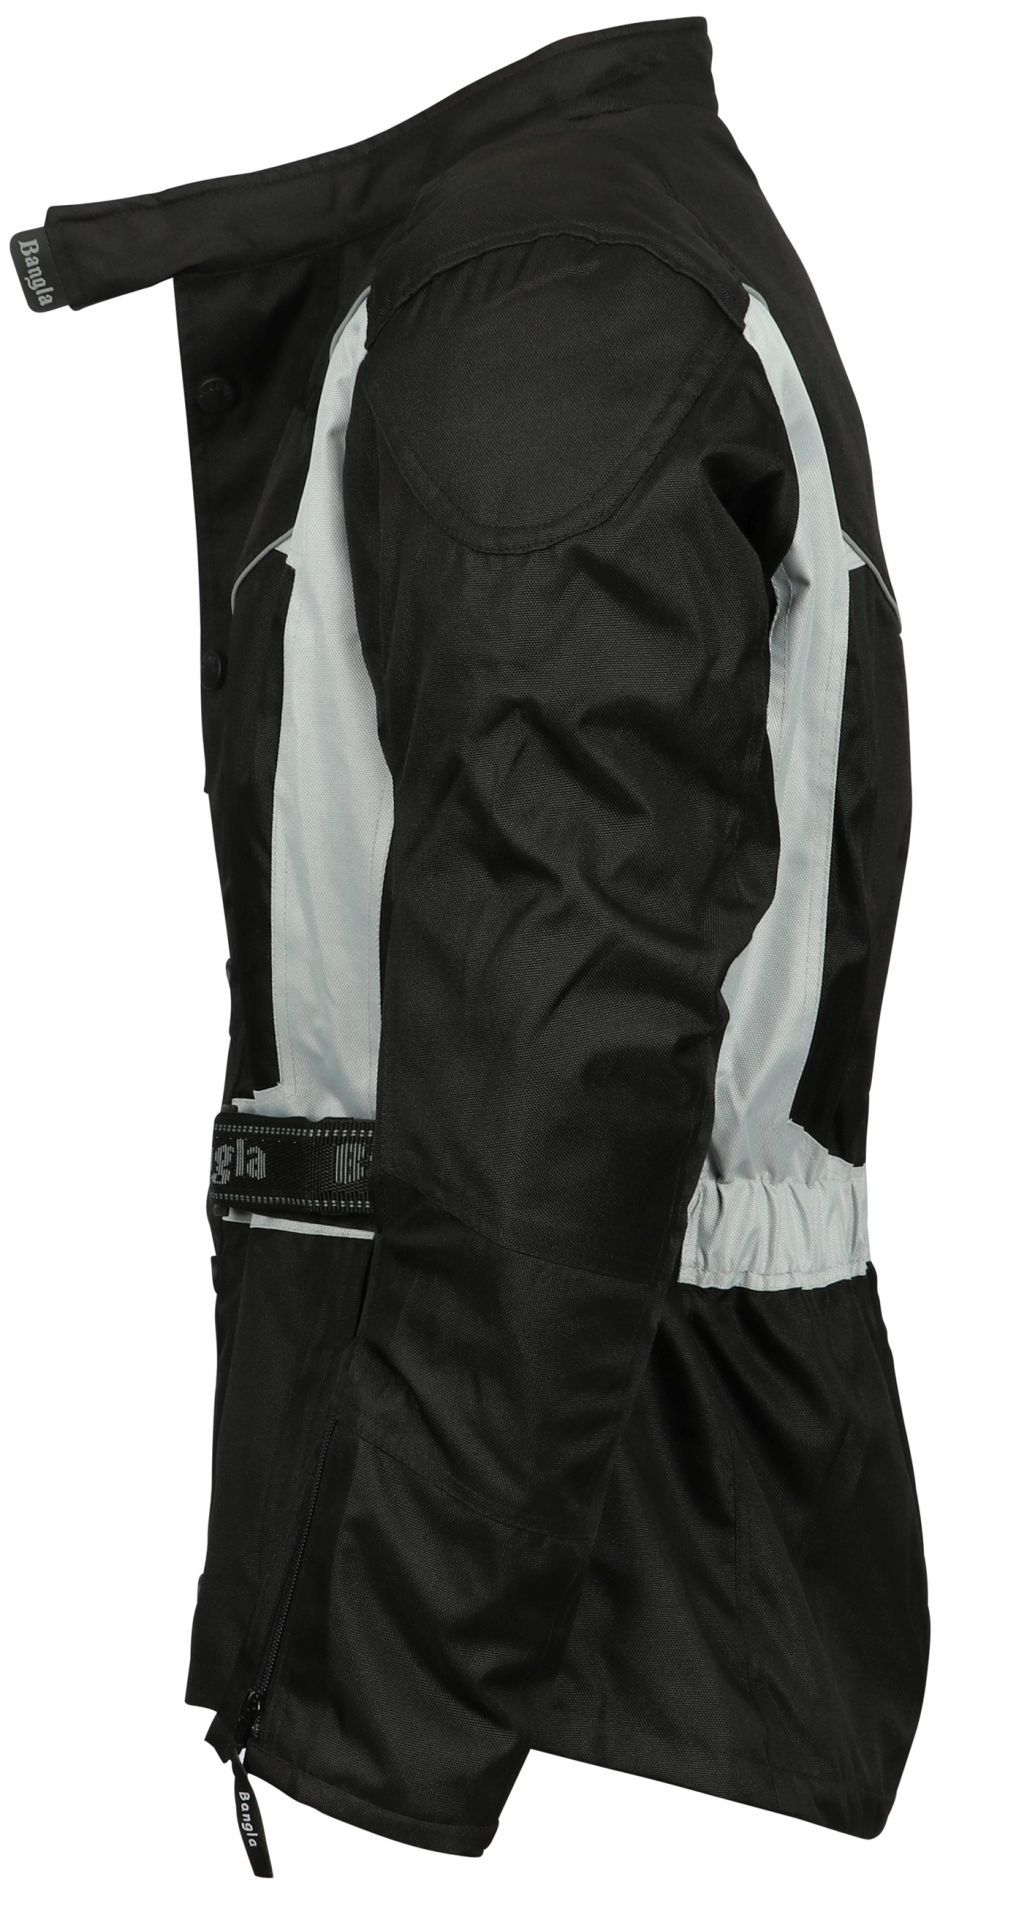 Bangla Motorradjacke Motorrad Jacke Textil Schwarz Grau Tourenjacke S - 7 XL